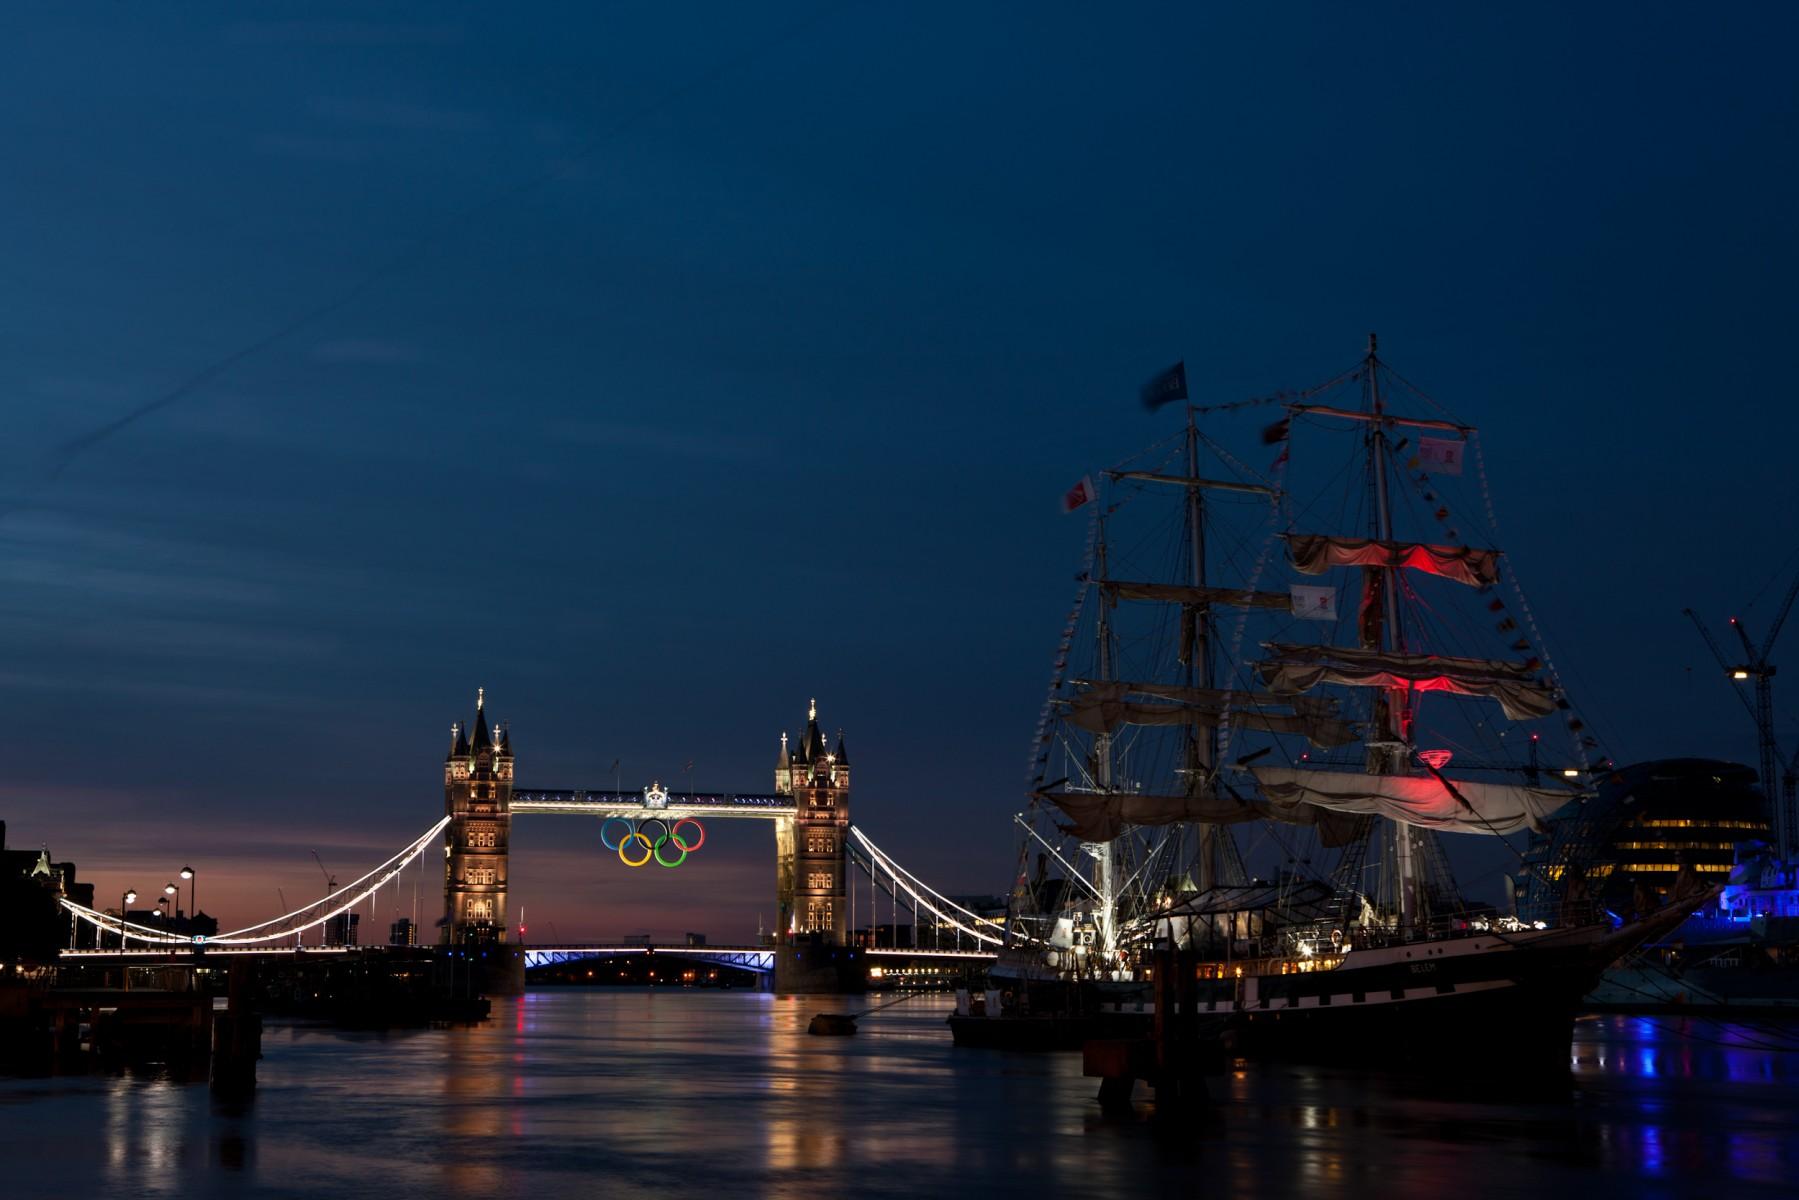 Olympic rings, Tower Bridge